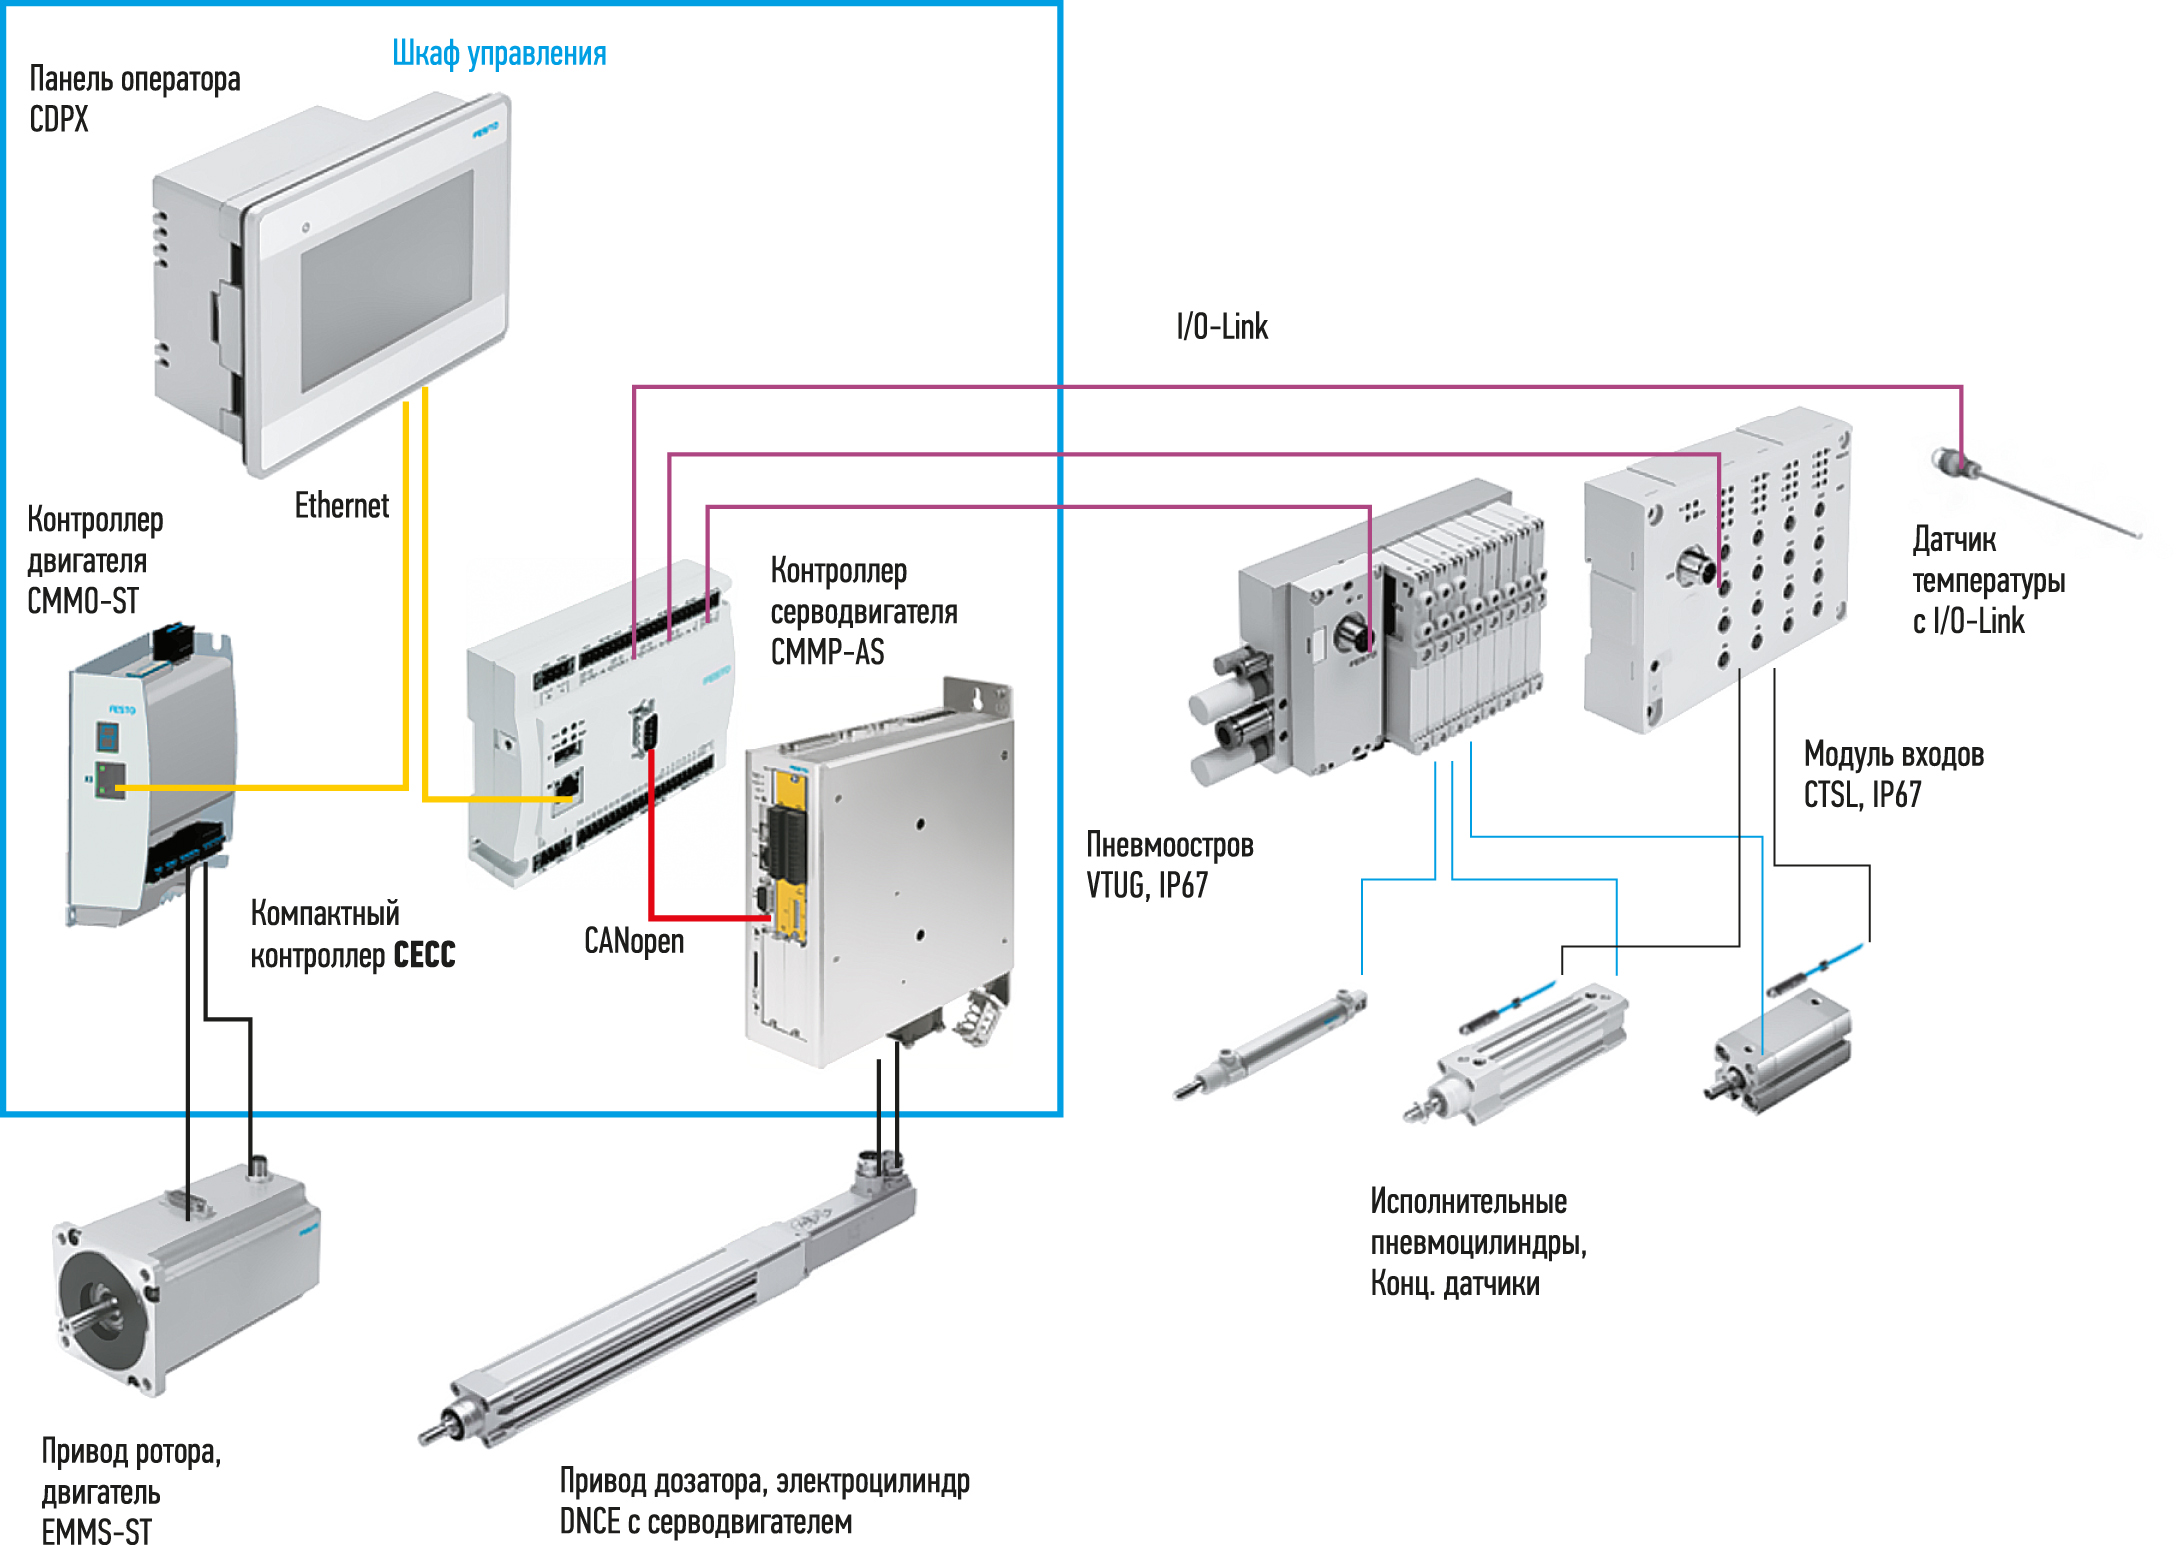 компактный контроллер CECC для задач мехатроники